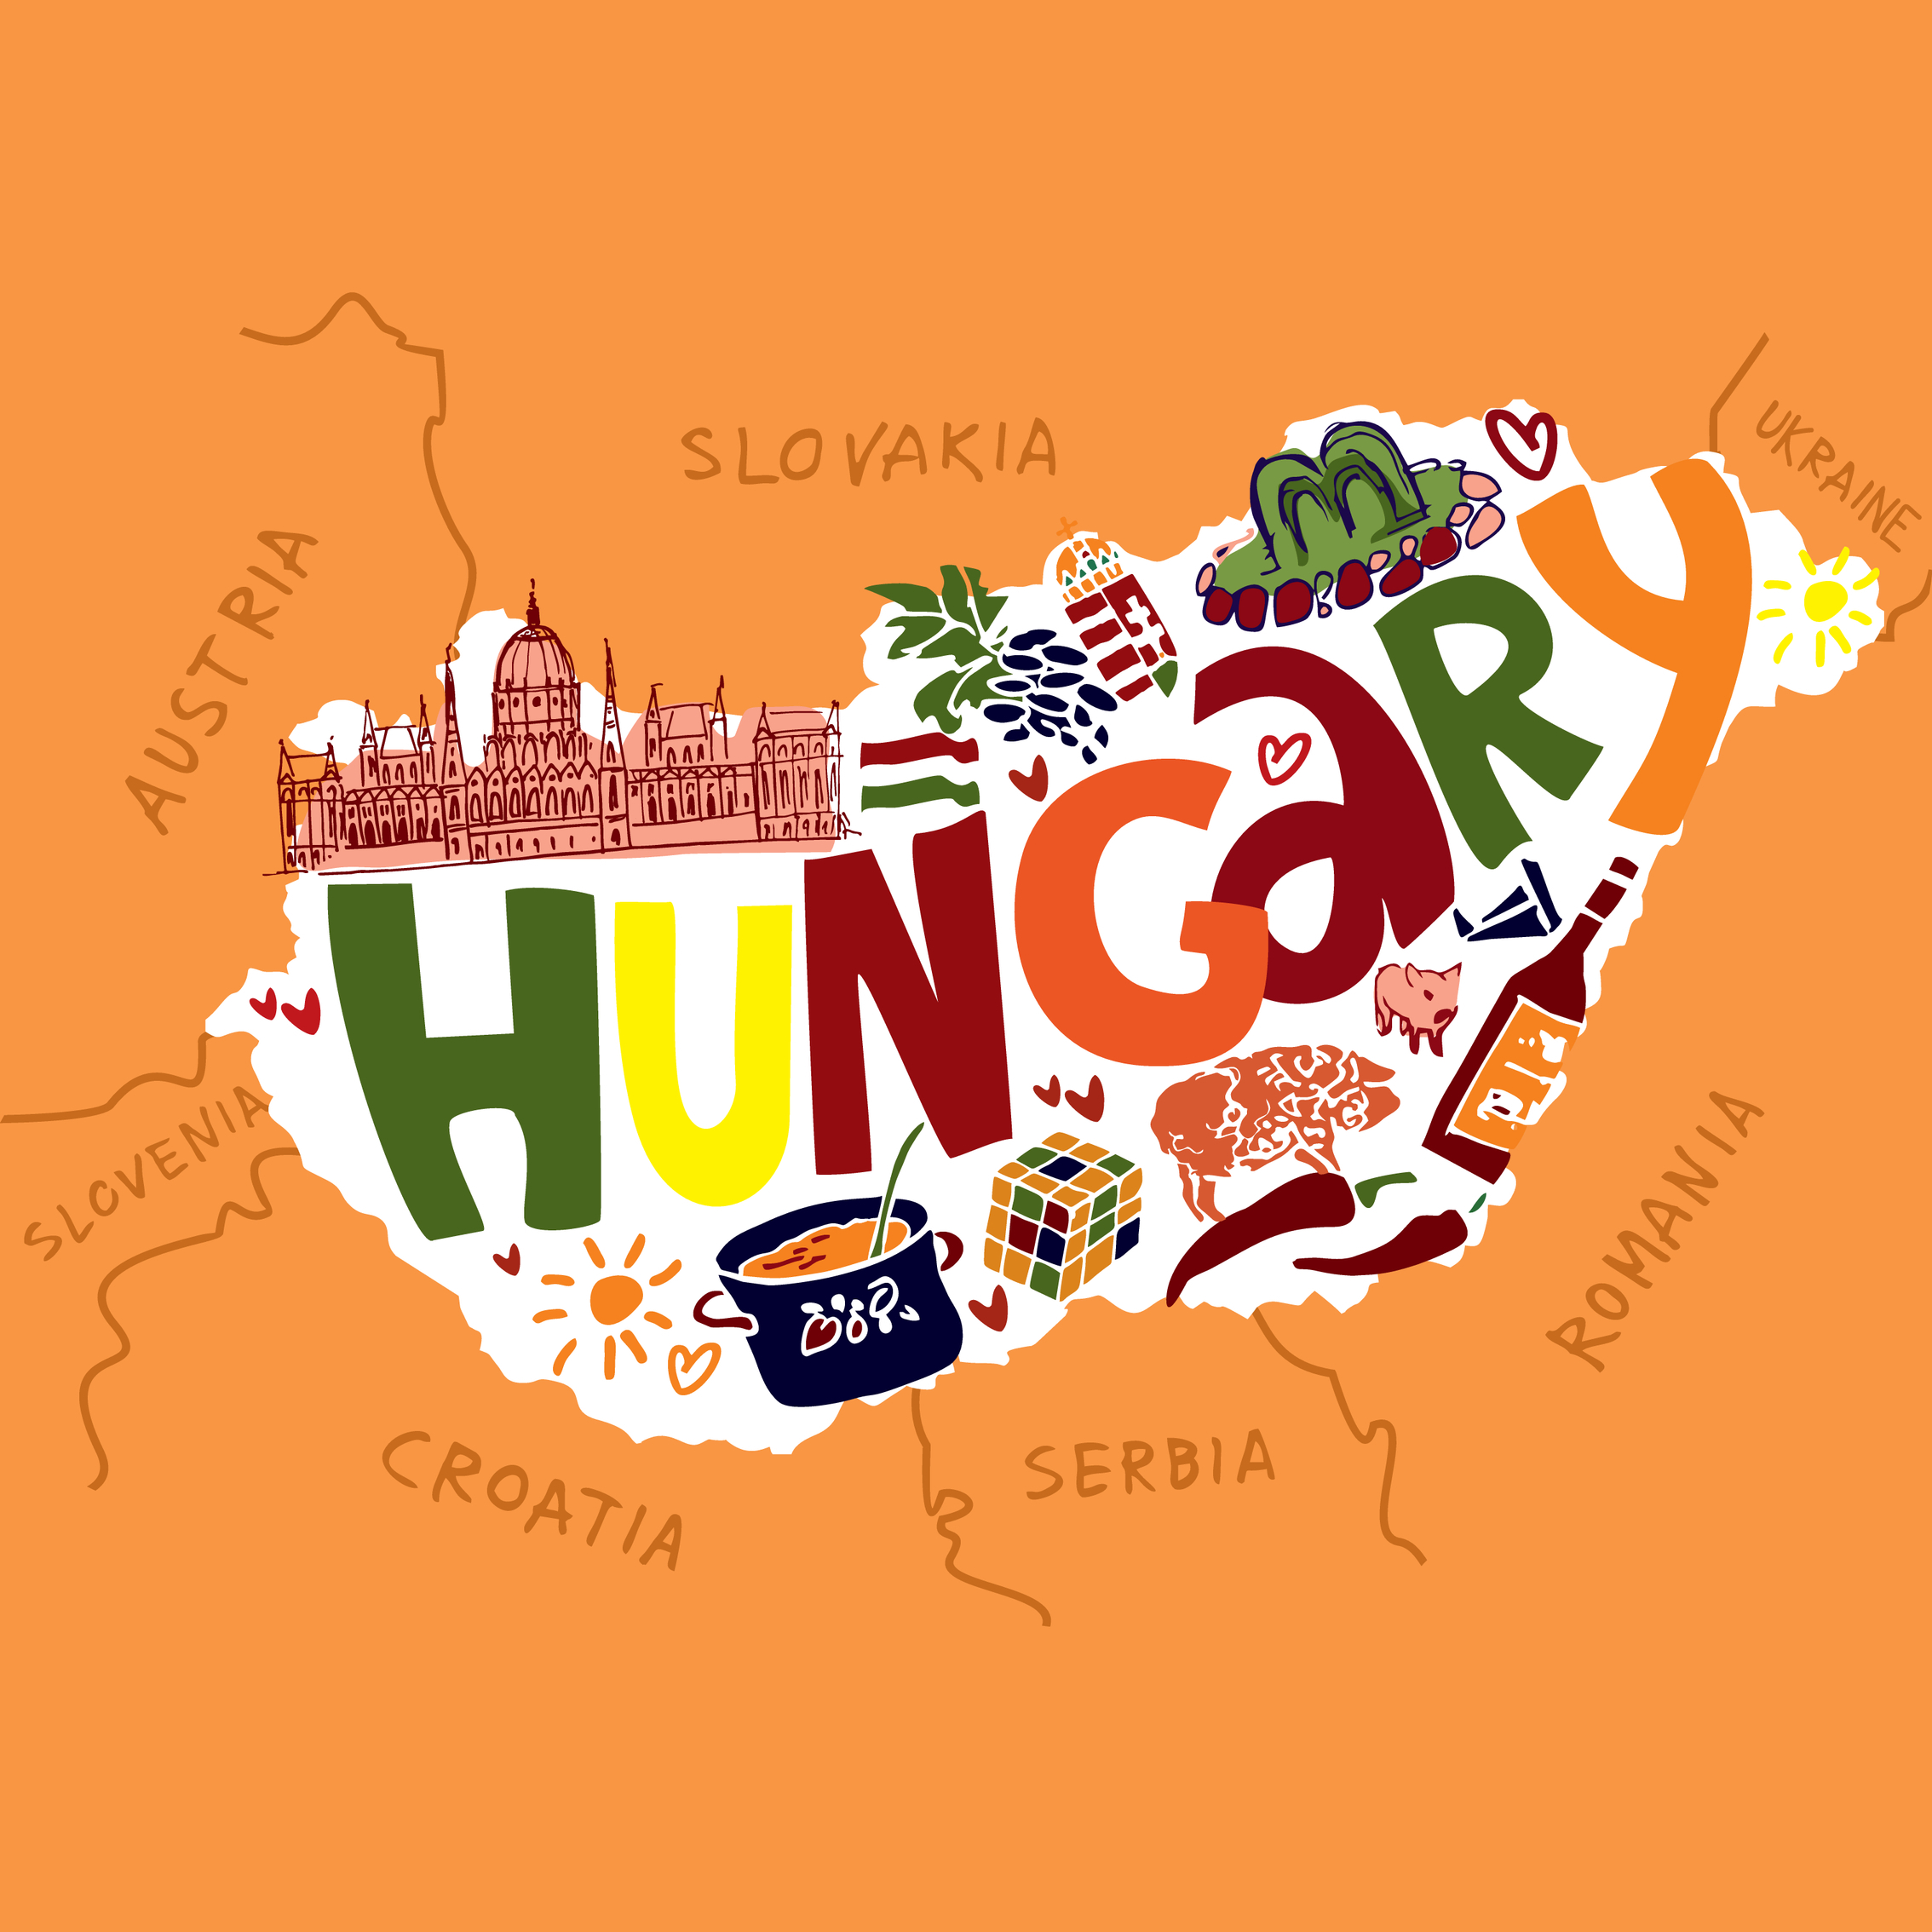 mappa ungheria investire ungheria